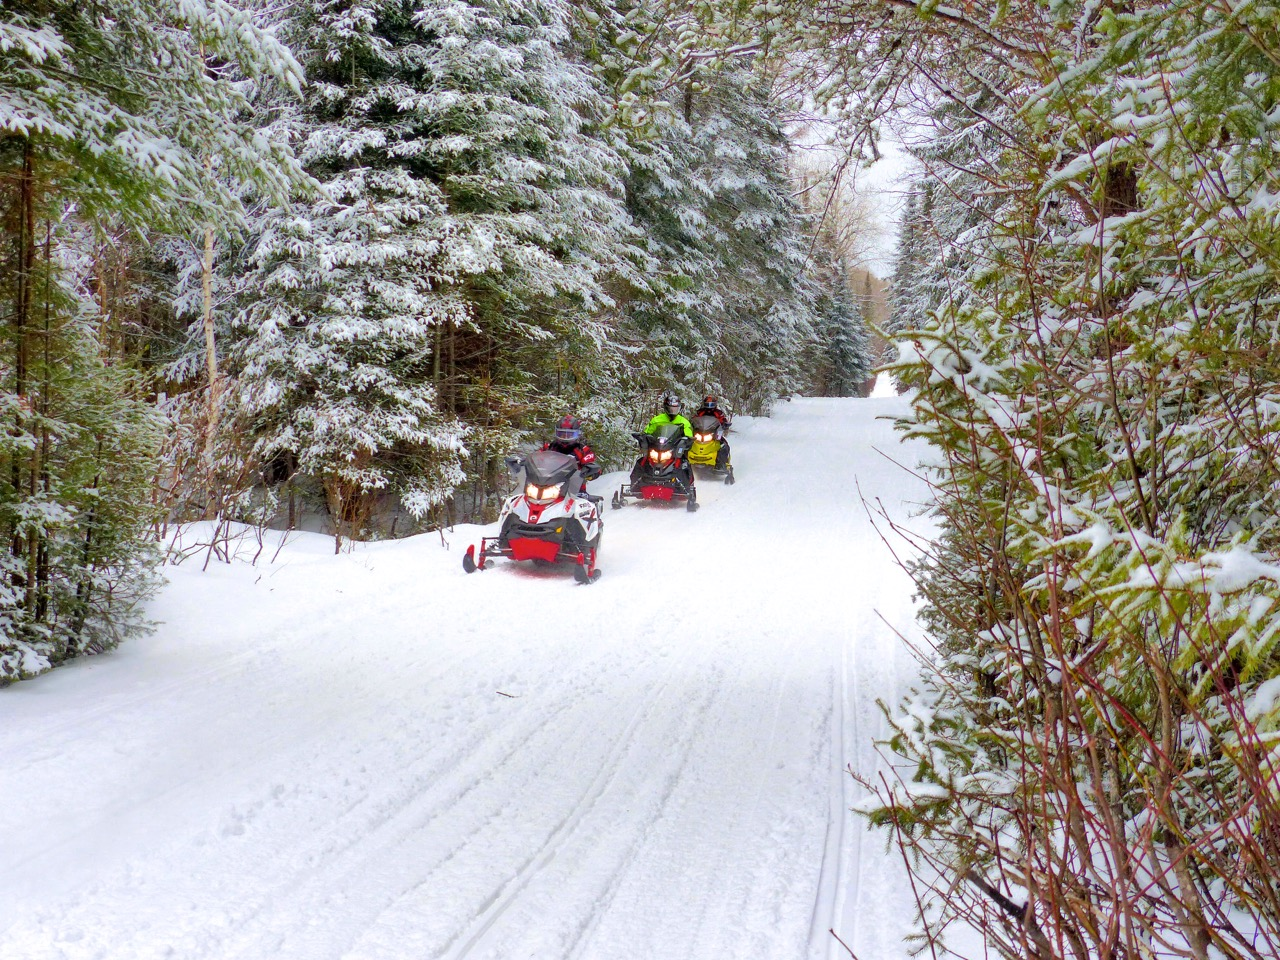 Ontario Snowmobile Tour Destinations Top 5